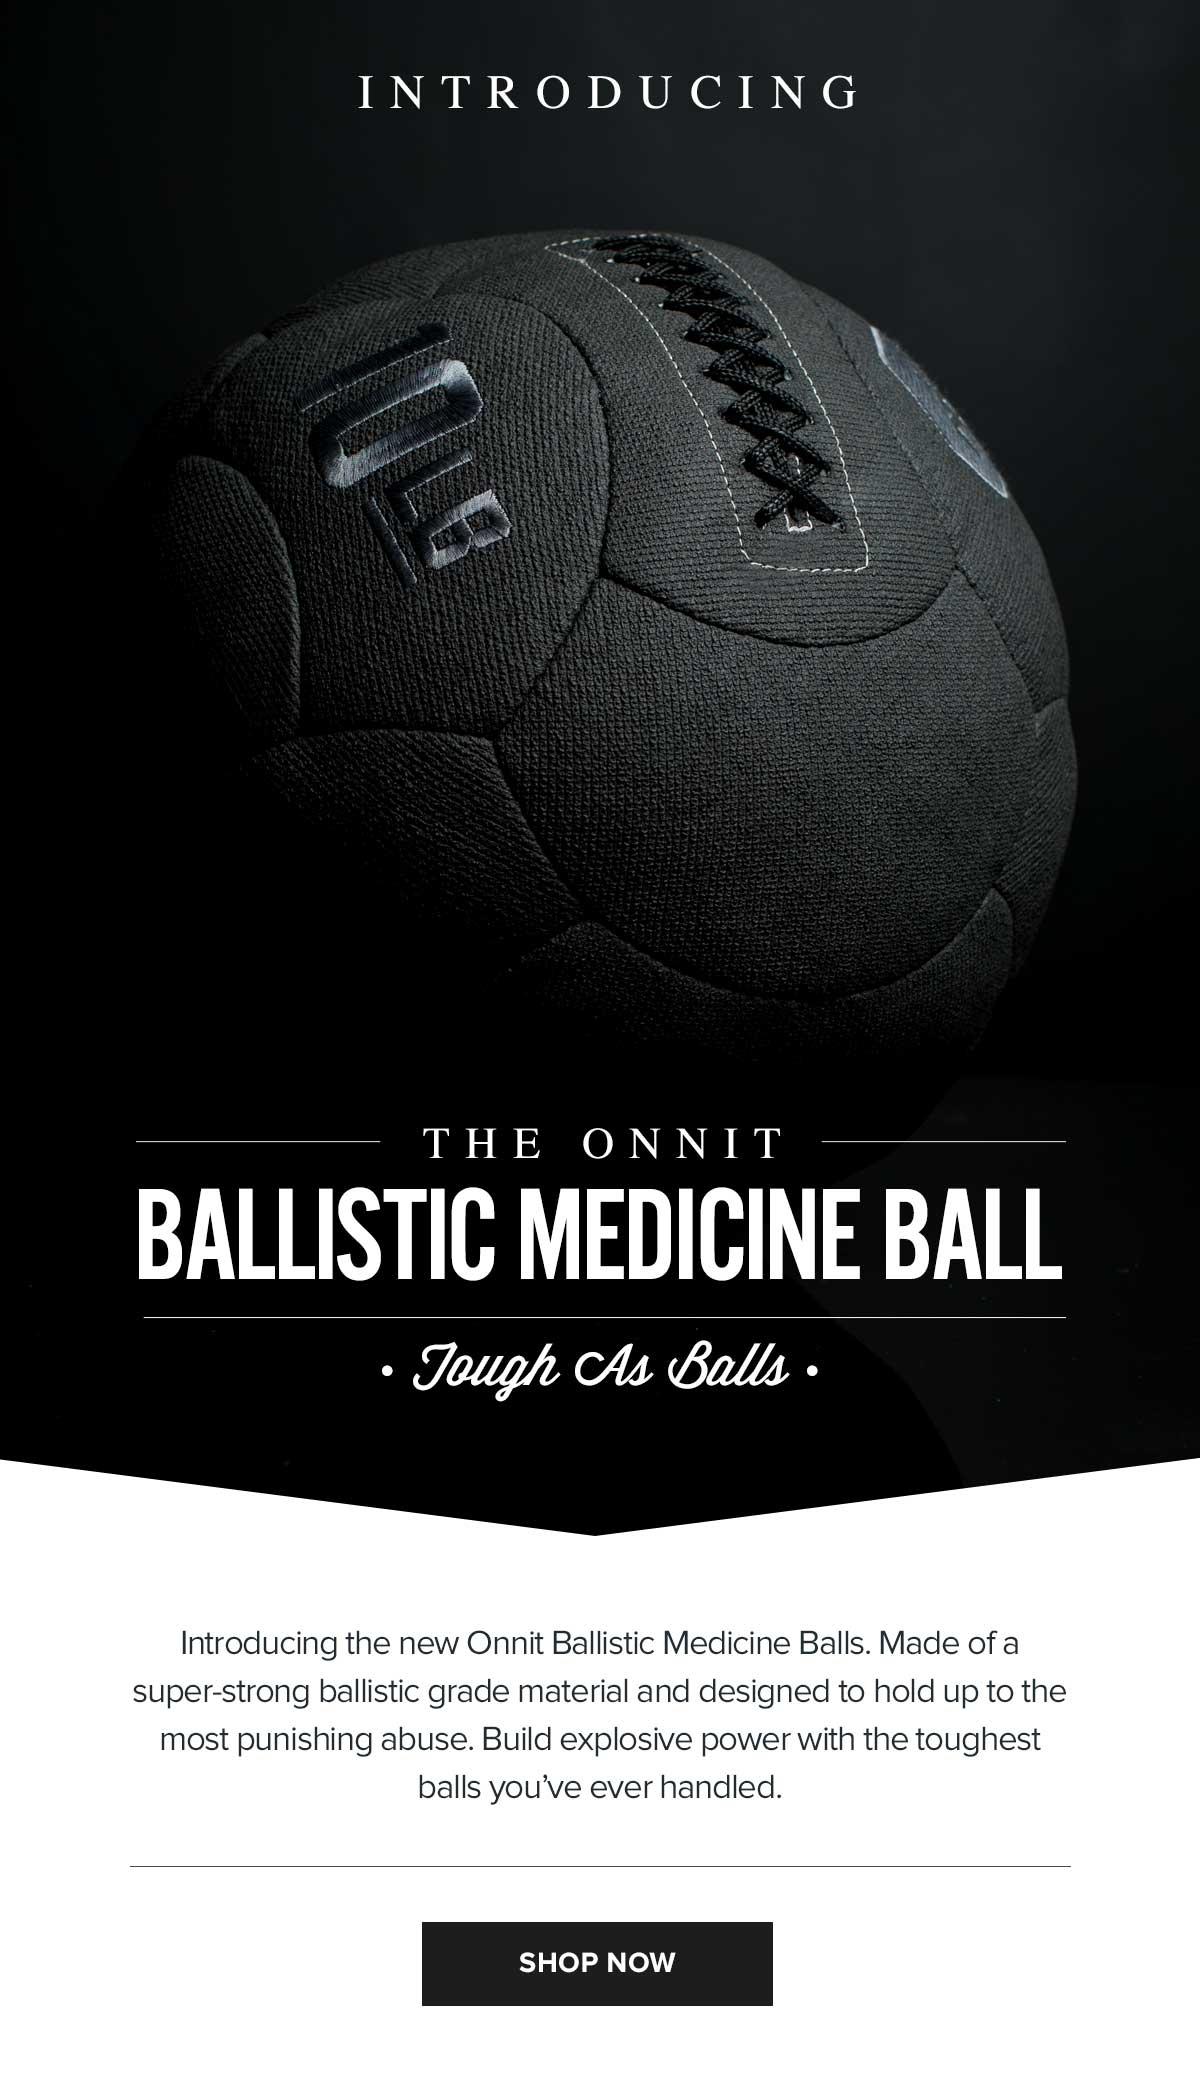 Onnit Ballistic Medicine Balls